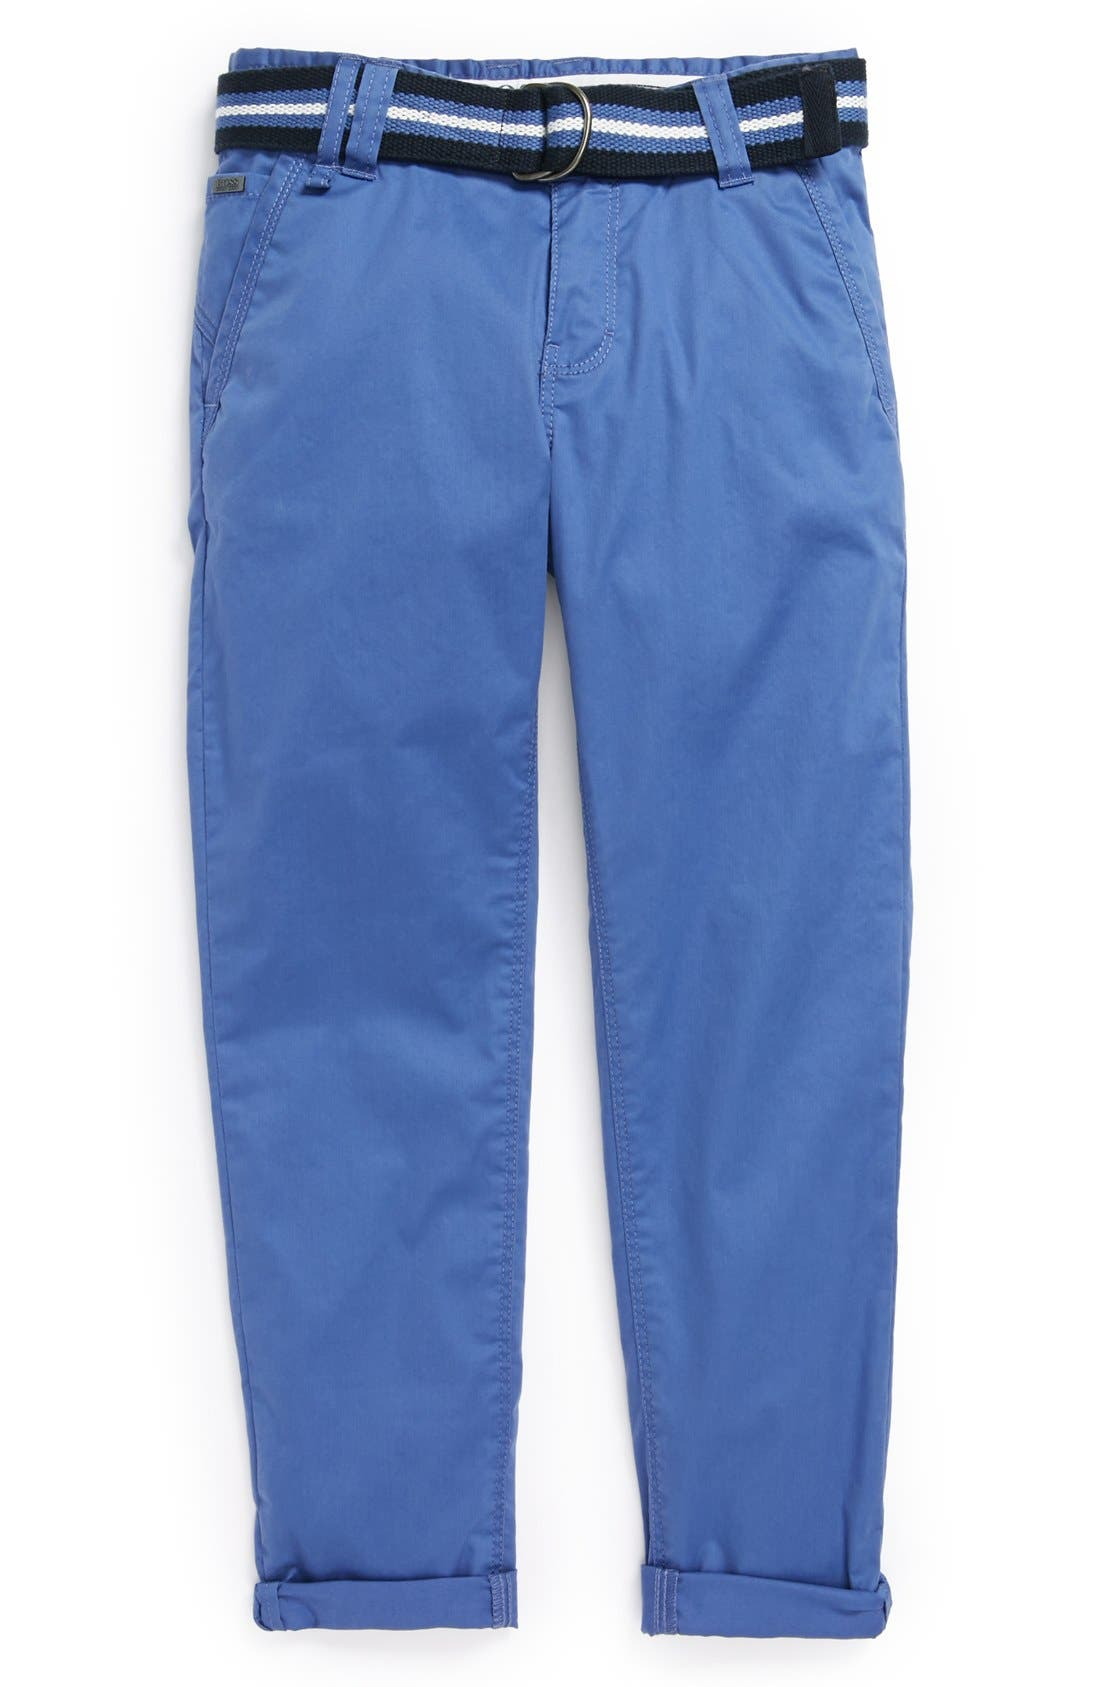 Alternate Image 1 Selected - BOSS Kidswear Twill Chino Pants (Little Boys & Big Boys)